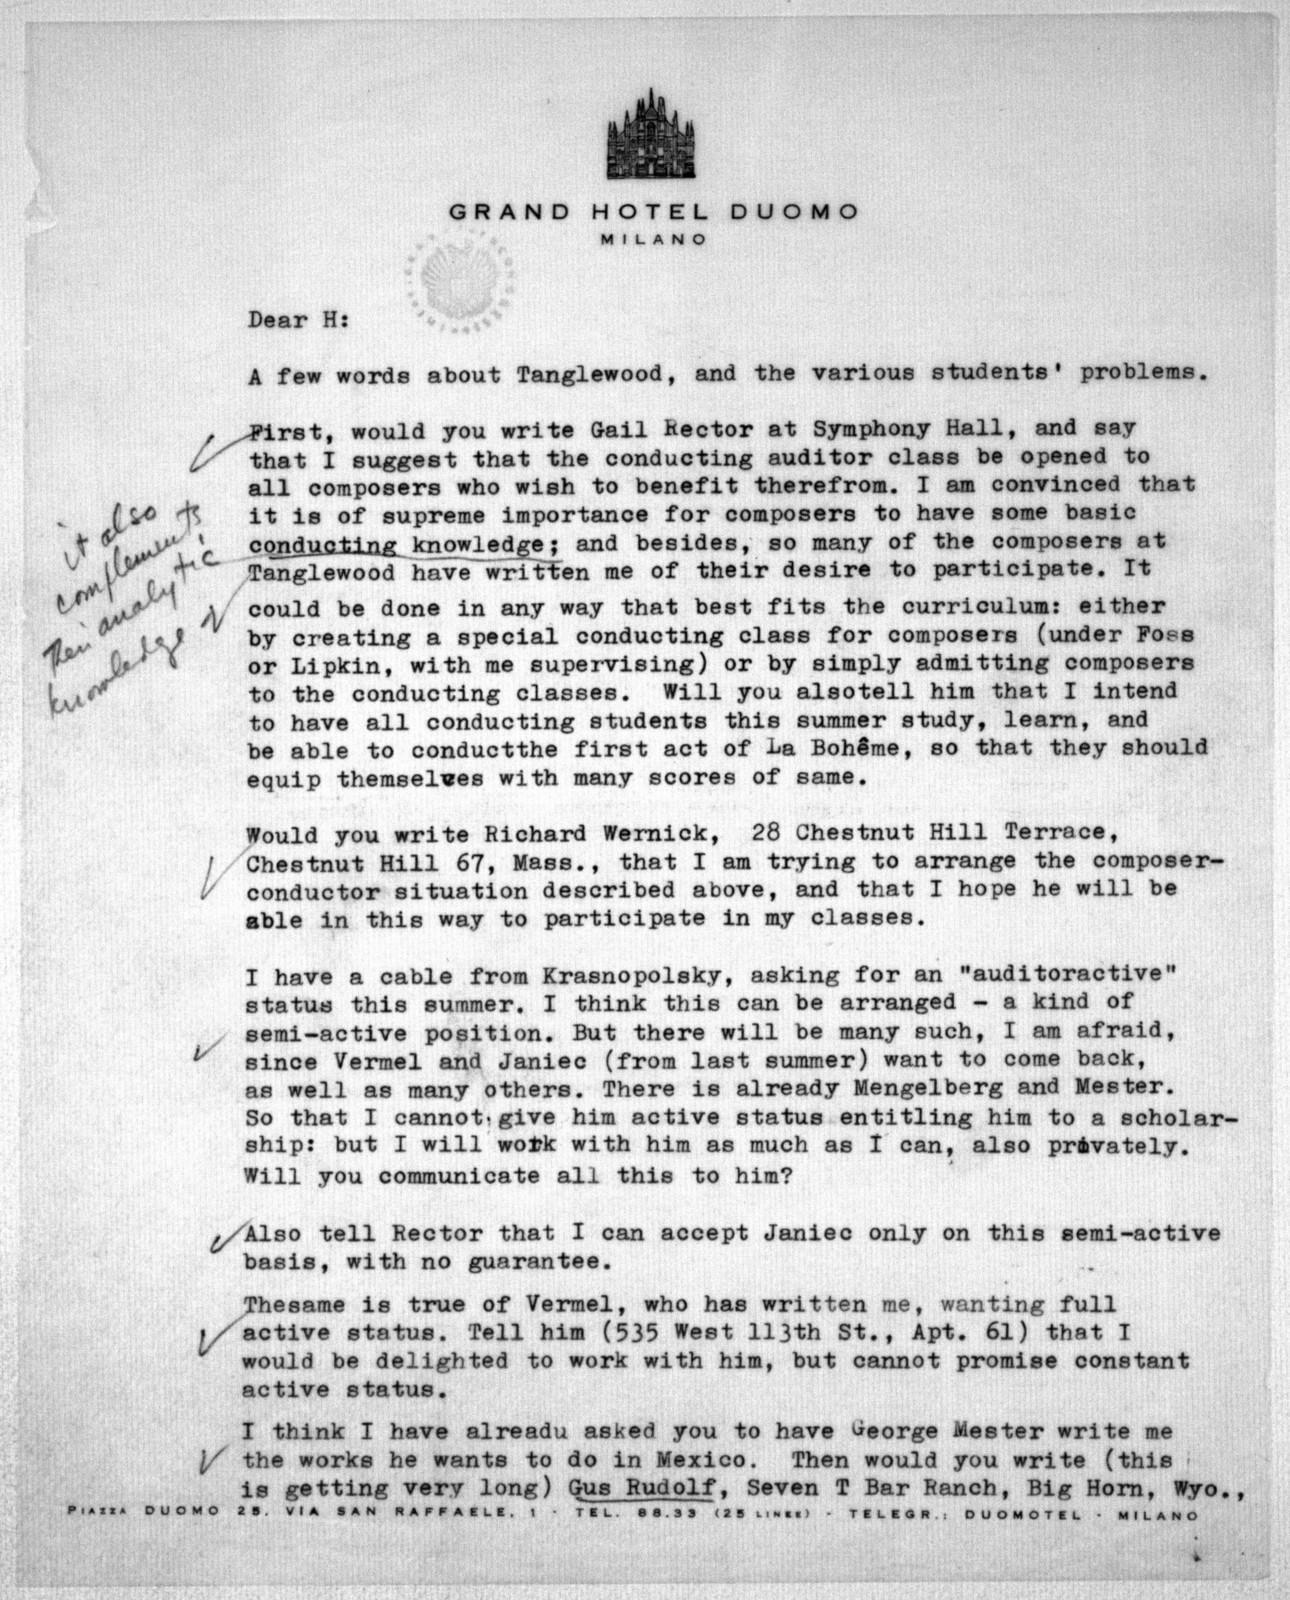 Letter from Leonard Bernstein to Helen Coates, April 18, 1955